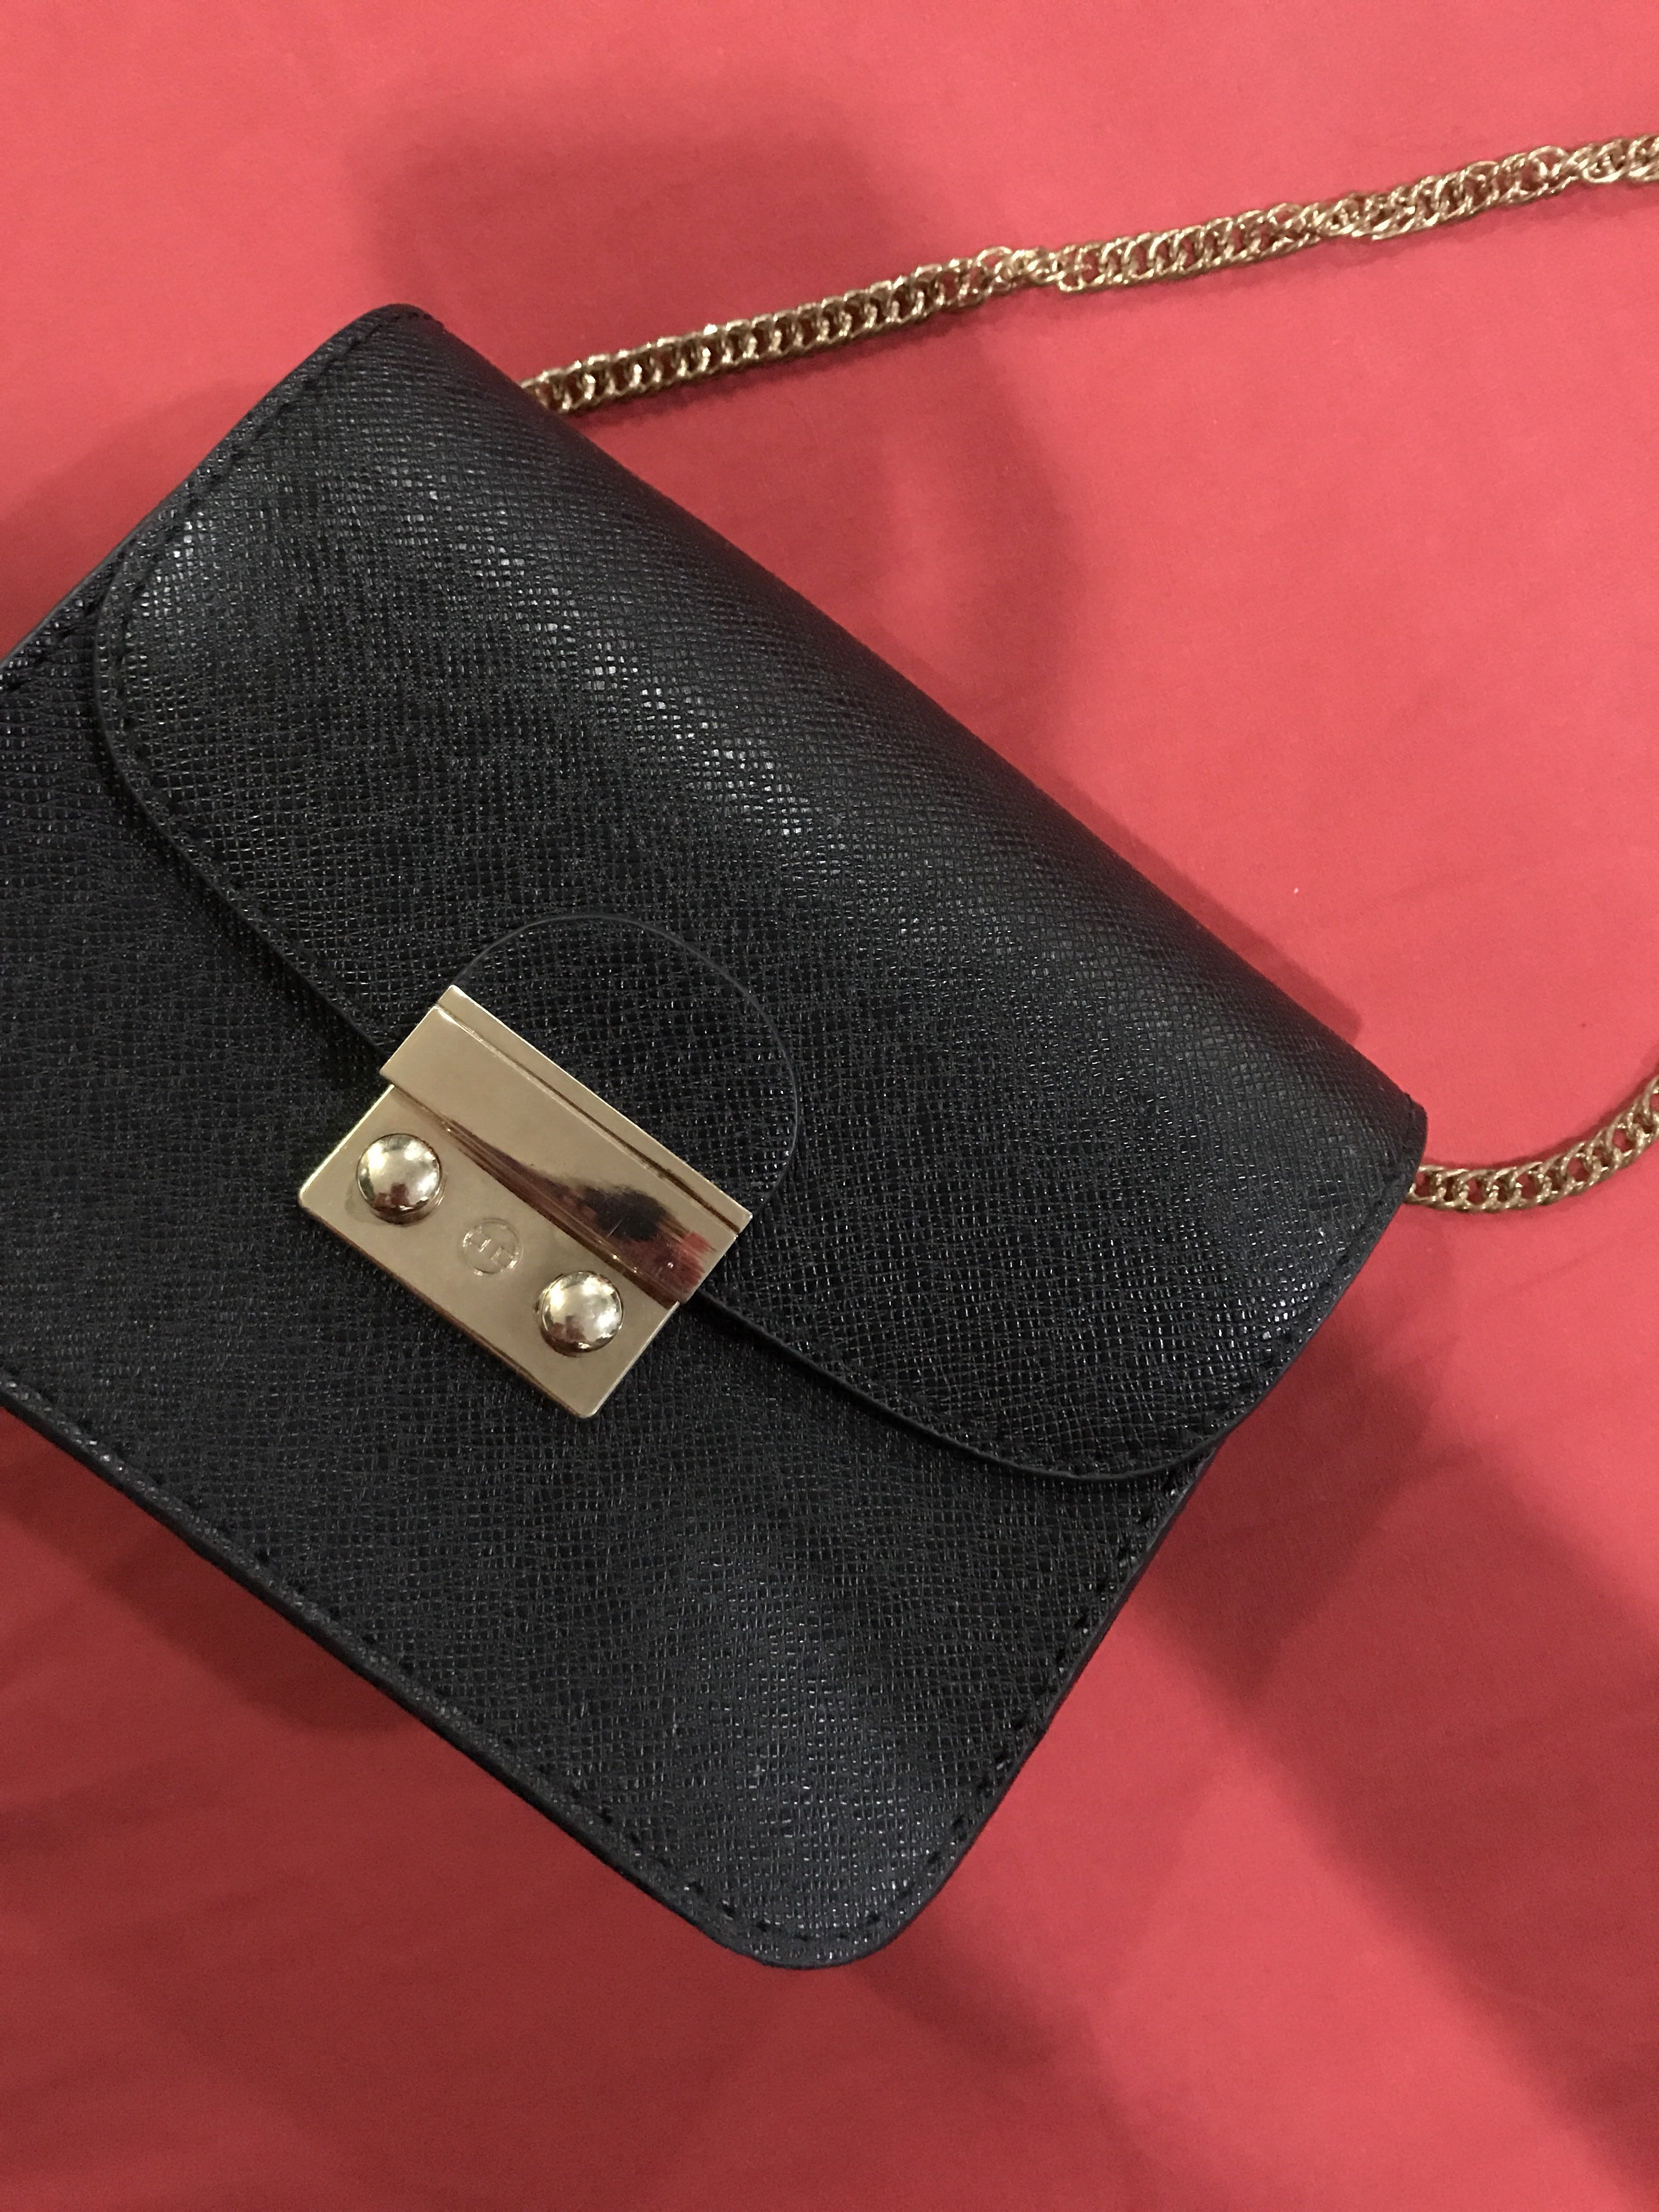 1e91340ccbb542 Home · Women's Fashion · Bags & Wallets. photo photo ...